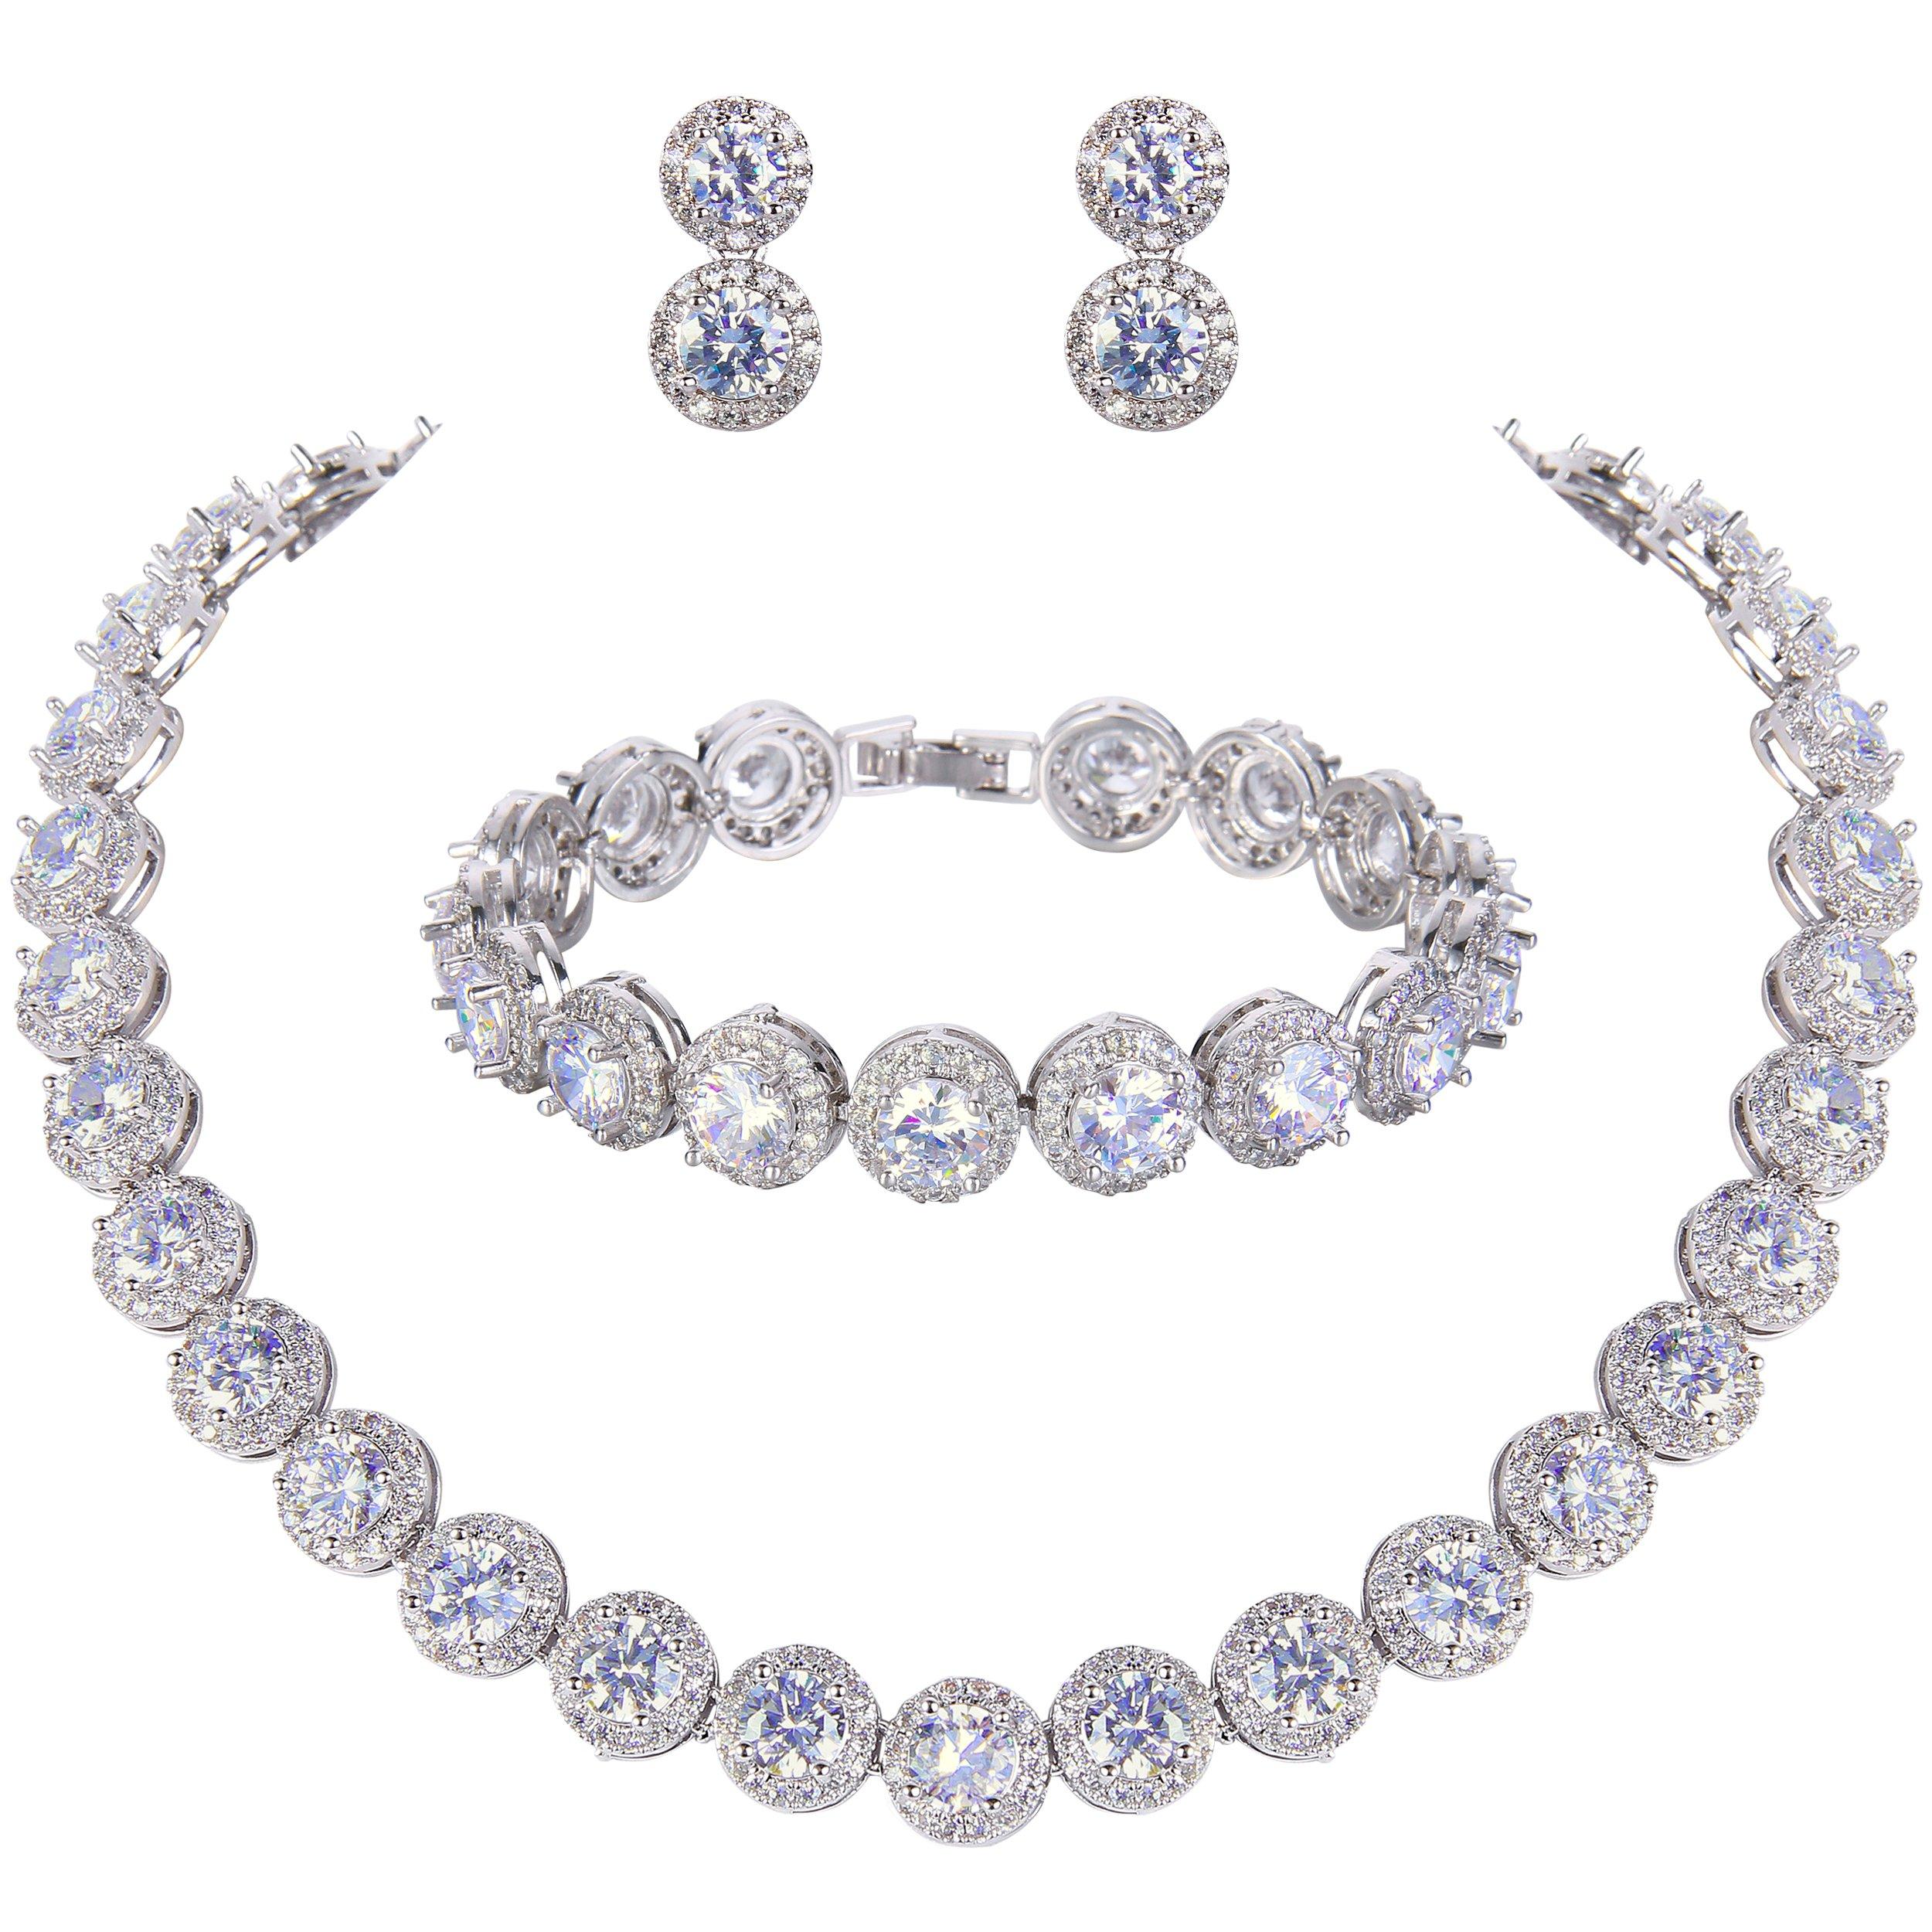 EVER FAITH Round Cut Cubic Zirconia Tennis Luxury Necklace Bracelet Earrings Set Clear Silver-Tone